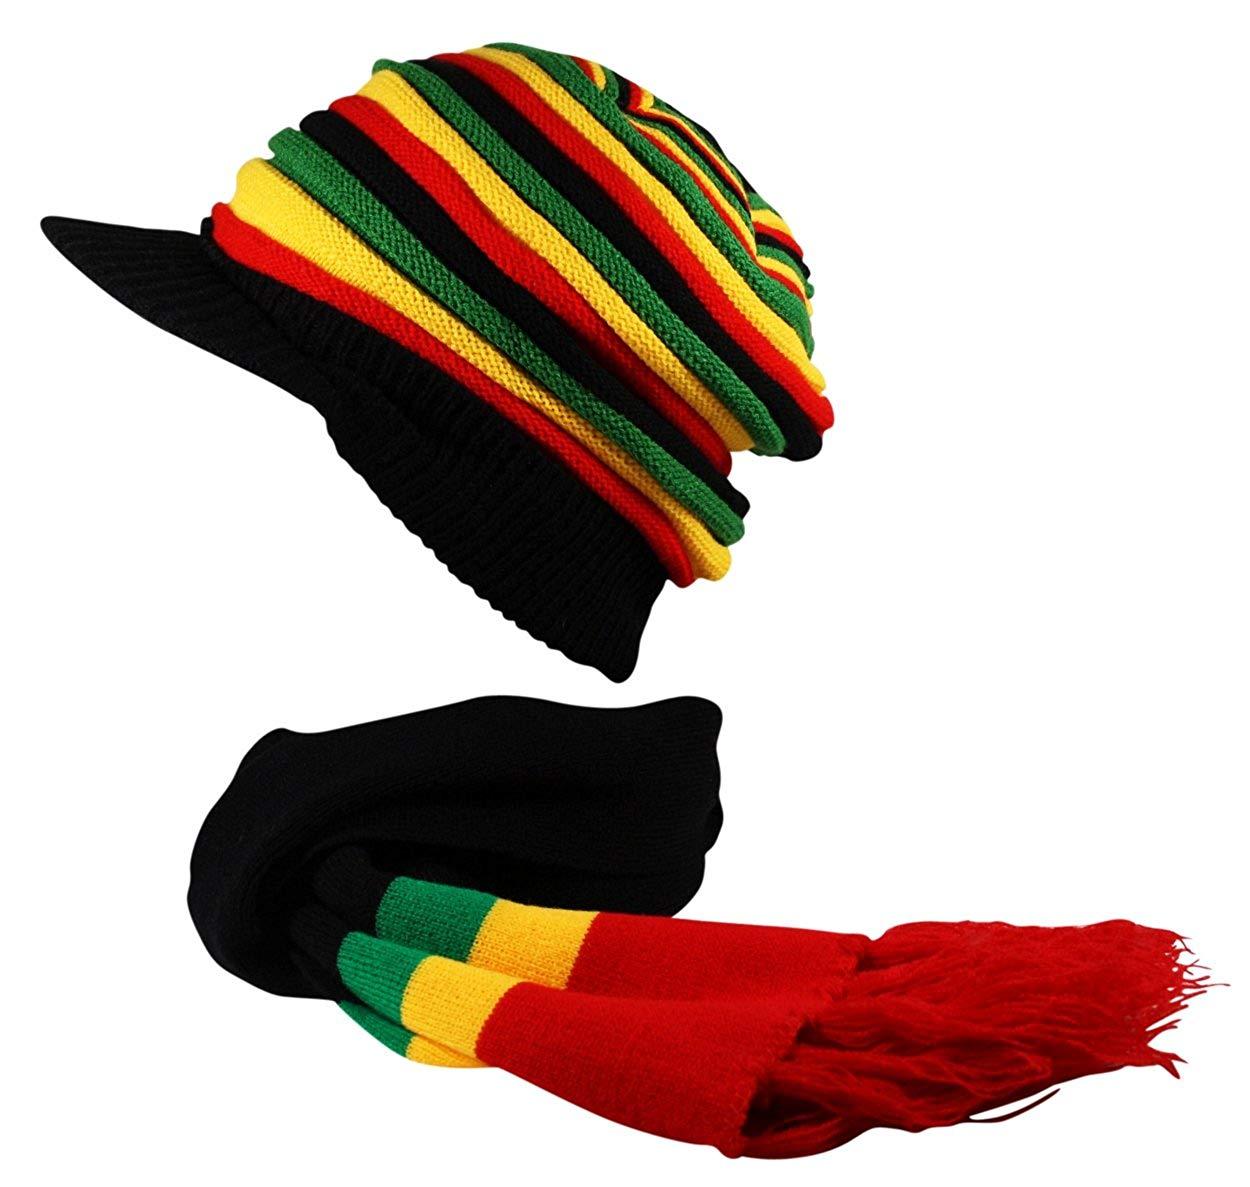 934f48a9e14 Cheap Black Rasta Hat, find Black Rasta Hat deals on line at Alibaba.com